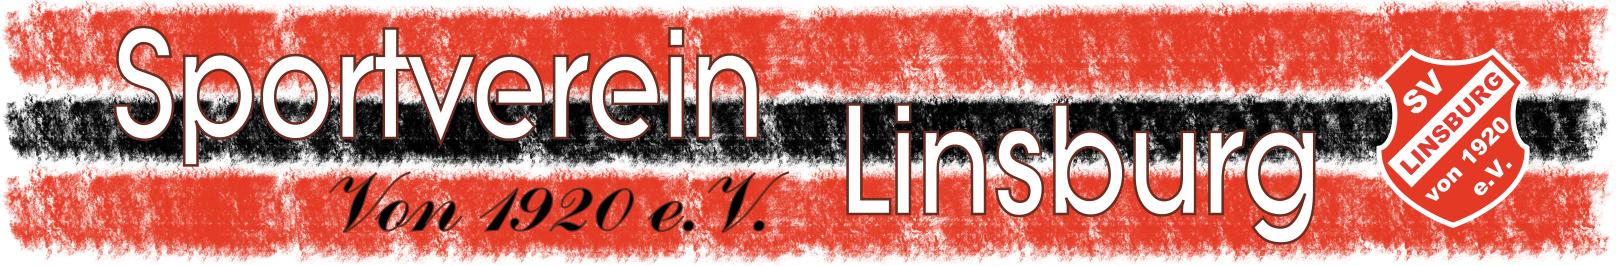 SVL-Banner